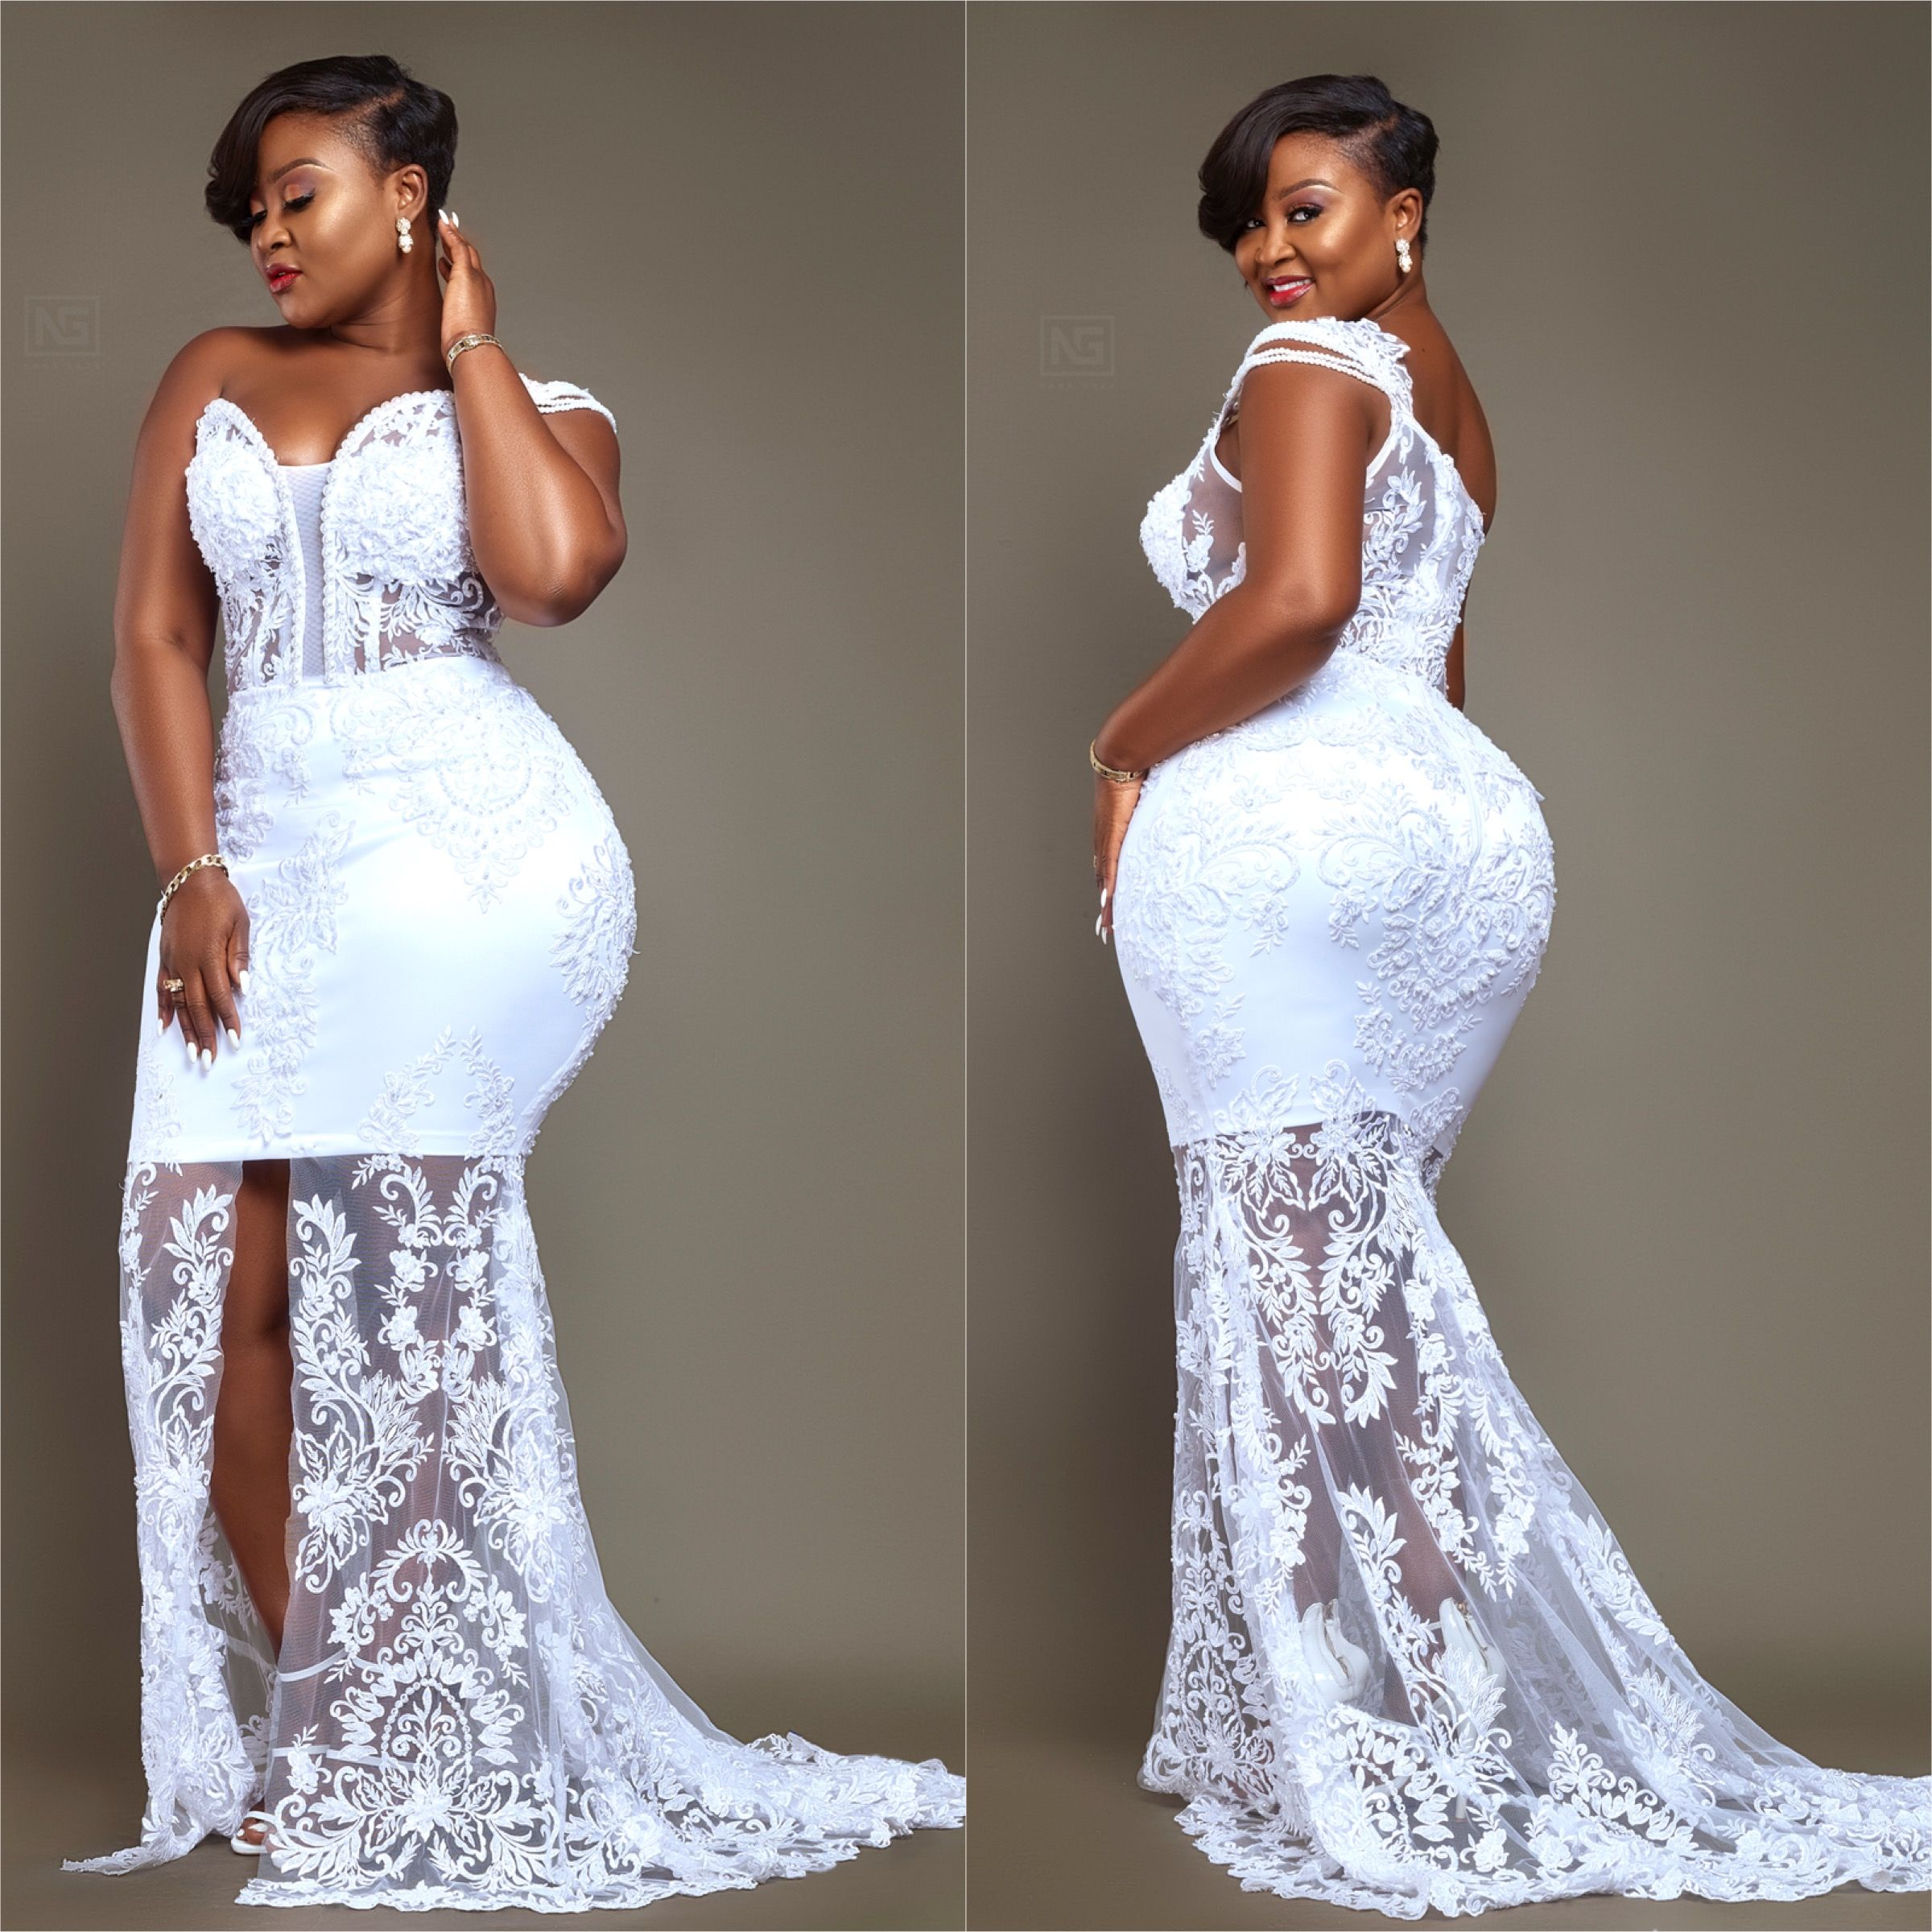 after wedding dress styles off 74% - gidagkp.org